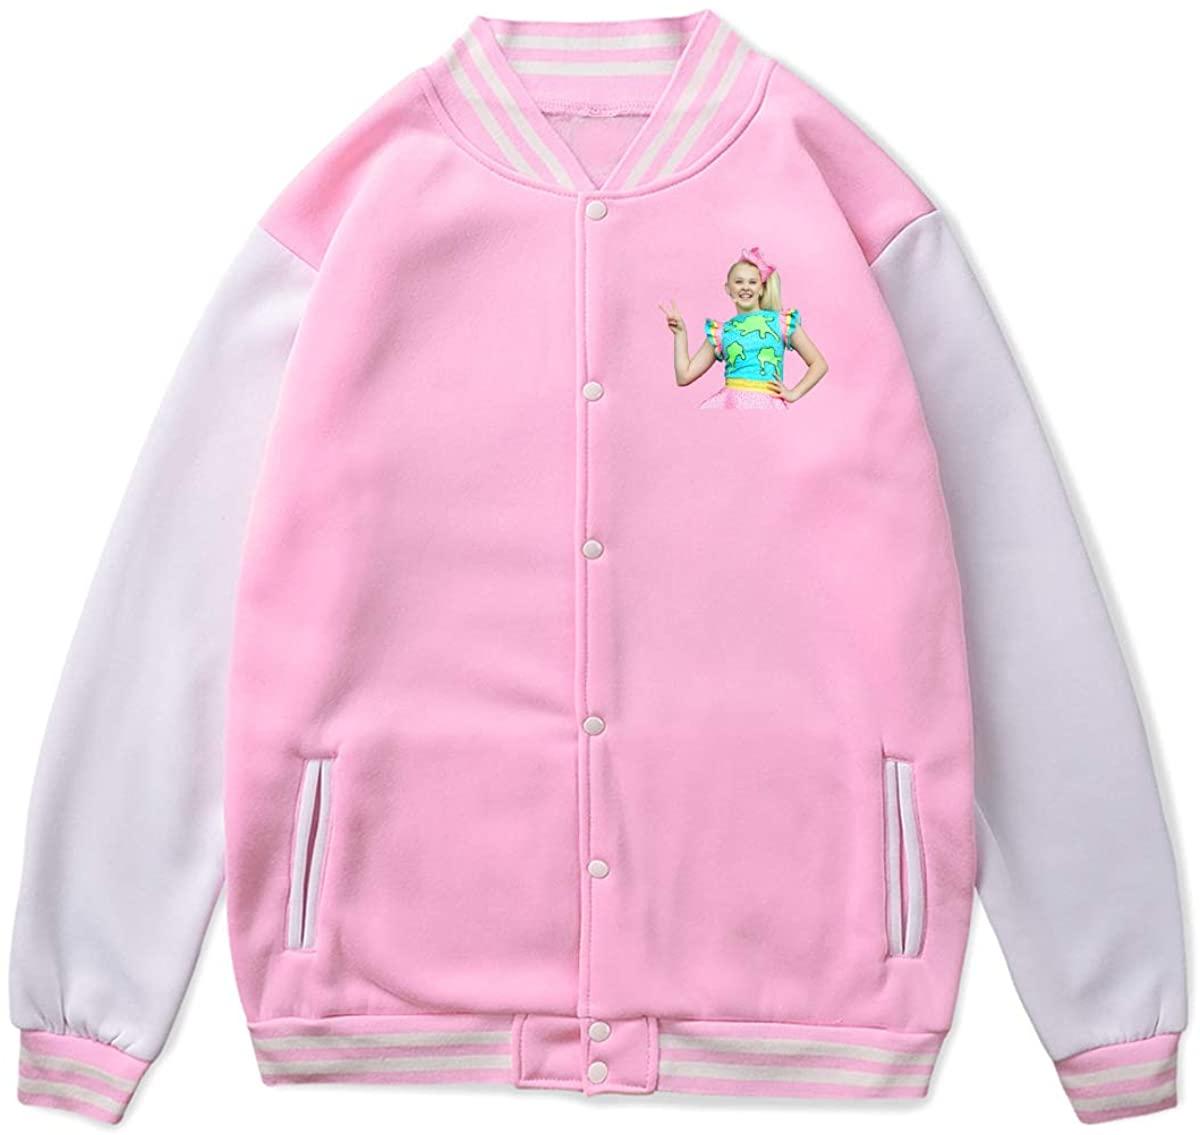 JoJo Siwa Baseball Uniform Front Pockets On Both Sides Cuffs Hem and Neckline Contrast Thread Jacket Sport Coat